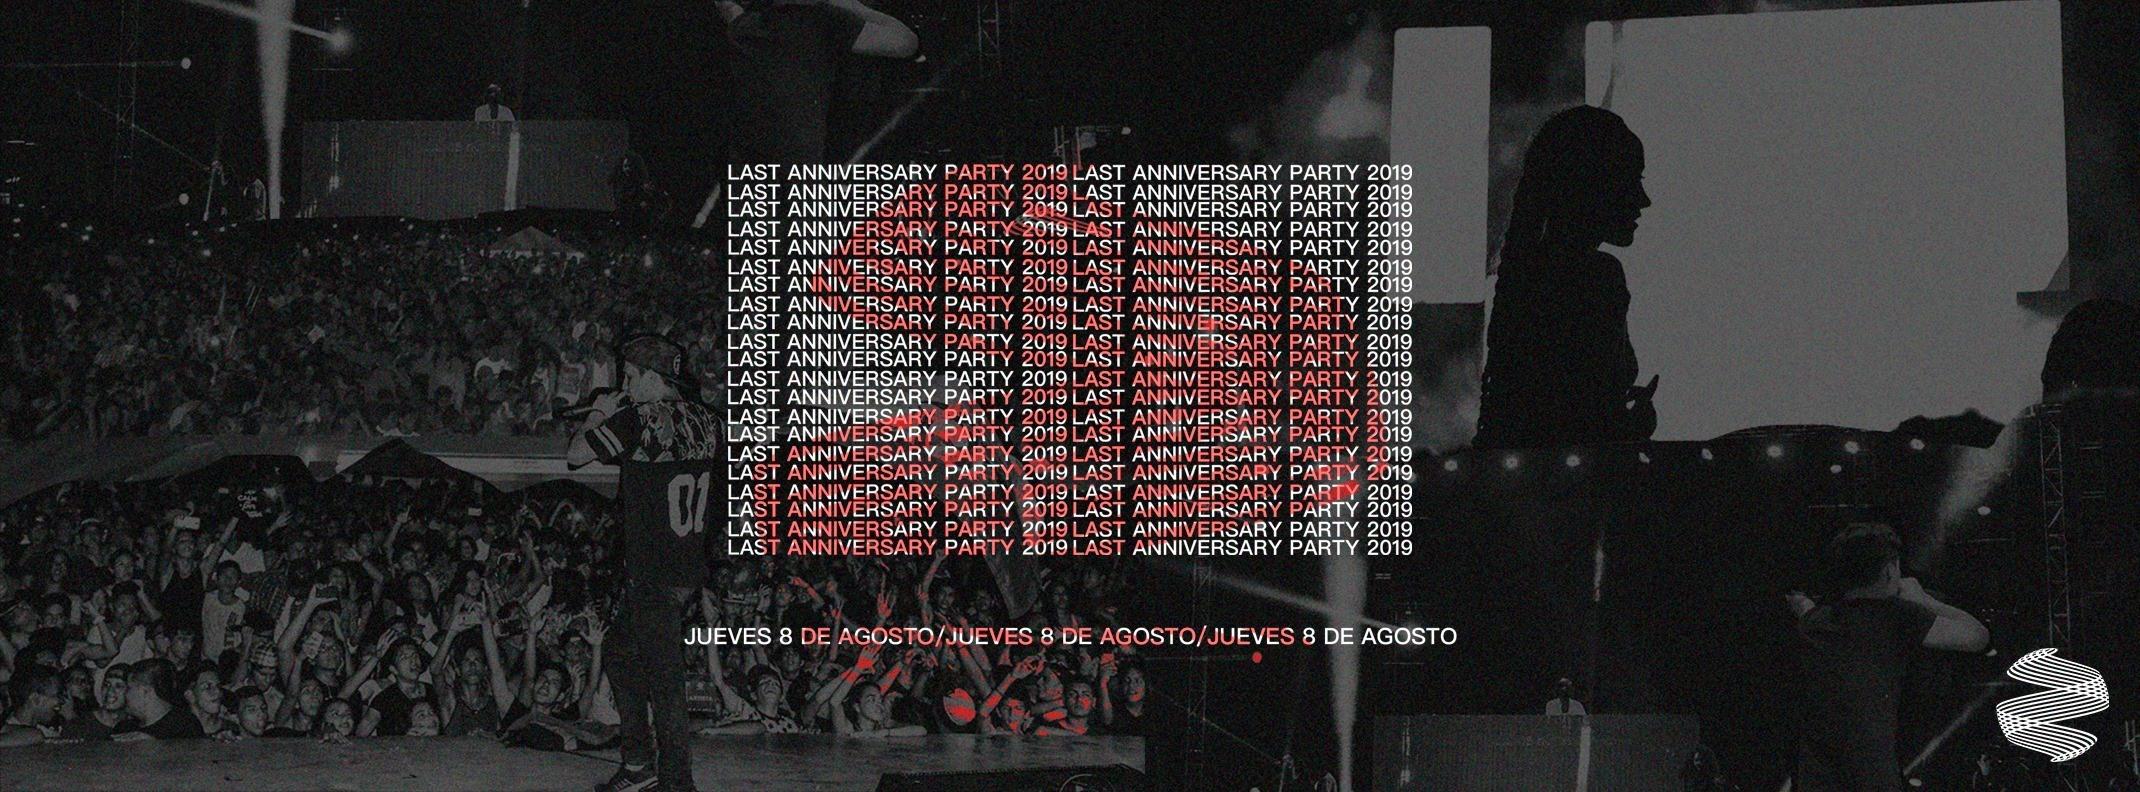 LAST Music Festival - South America Festivals